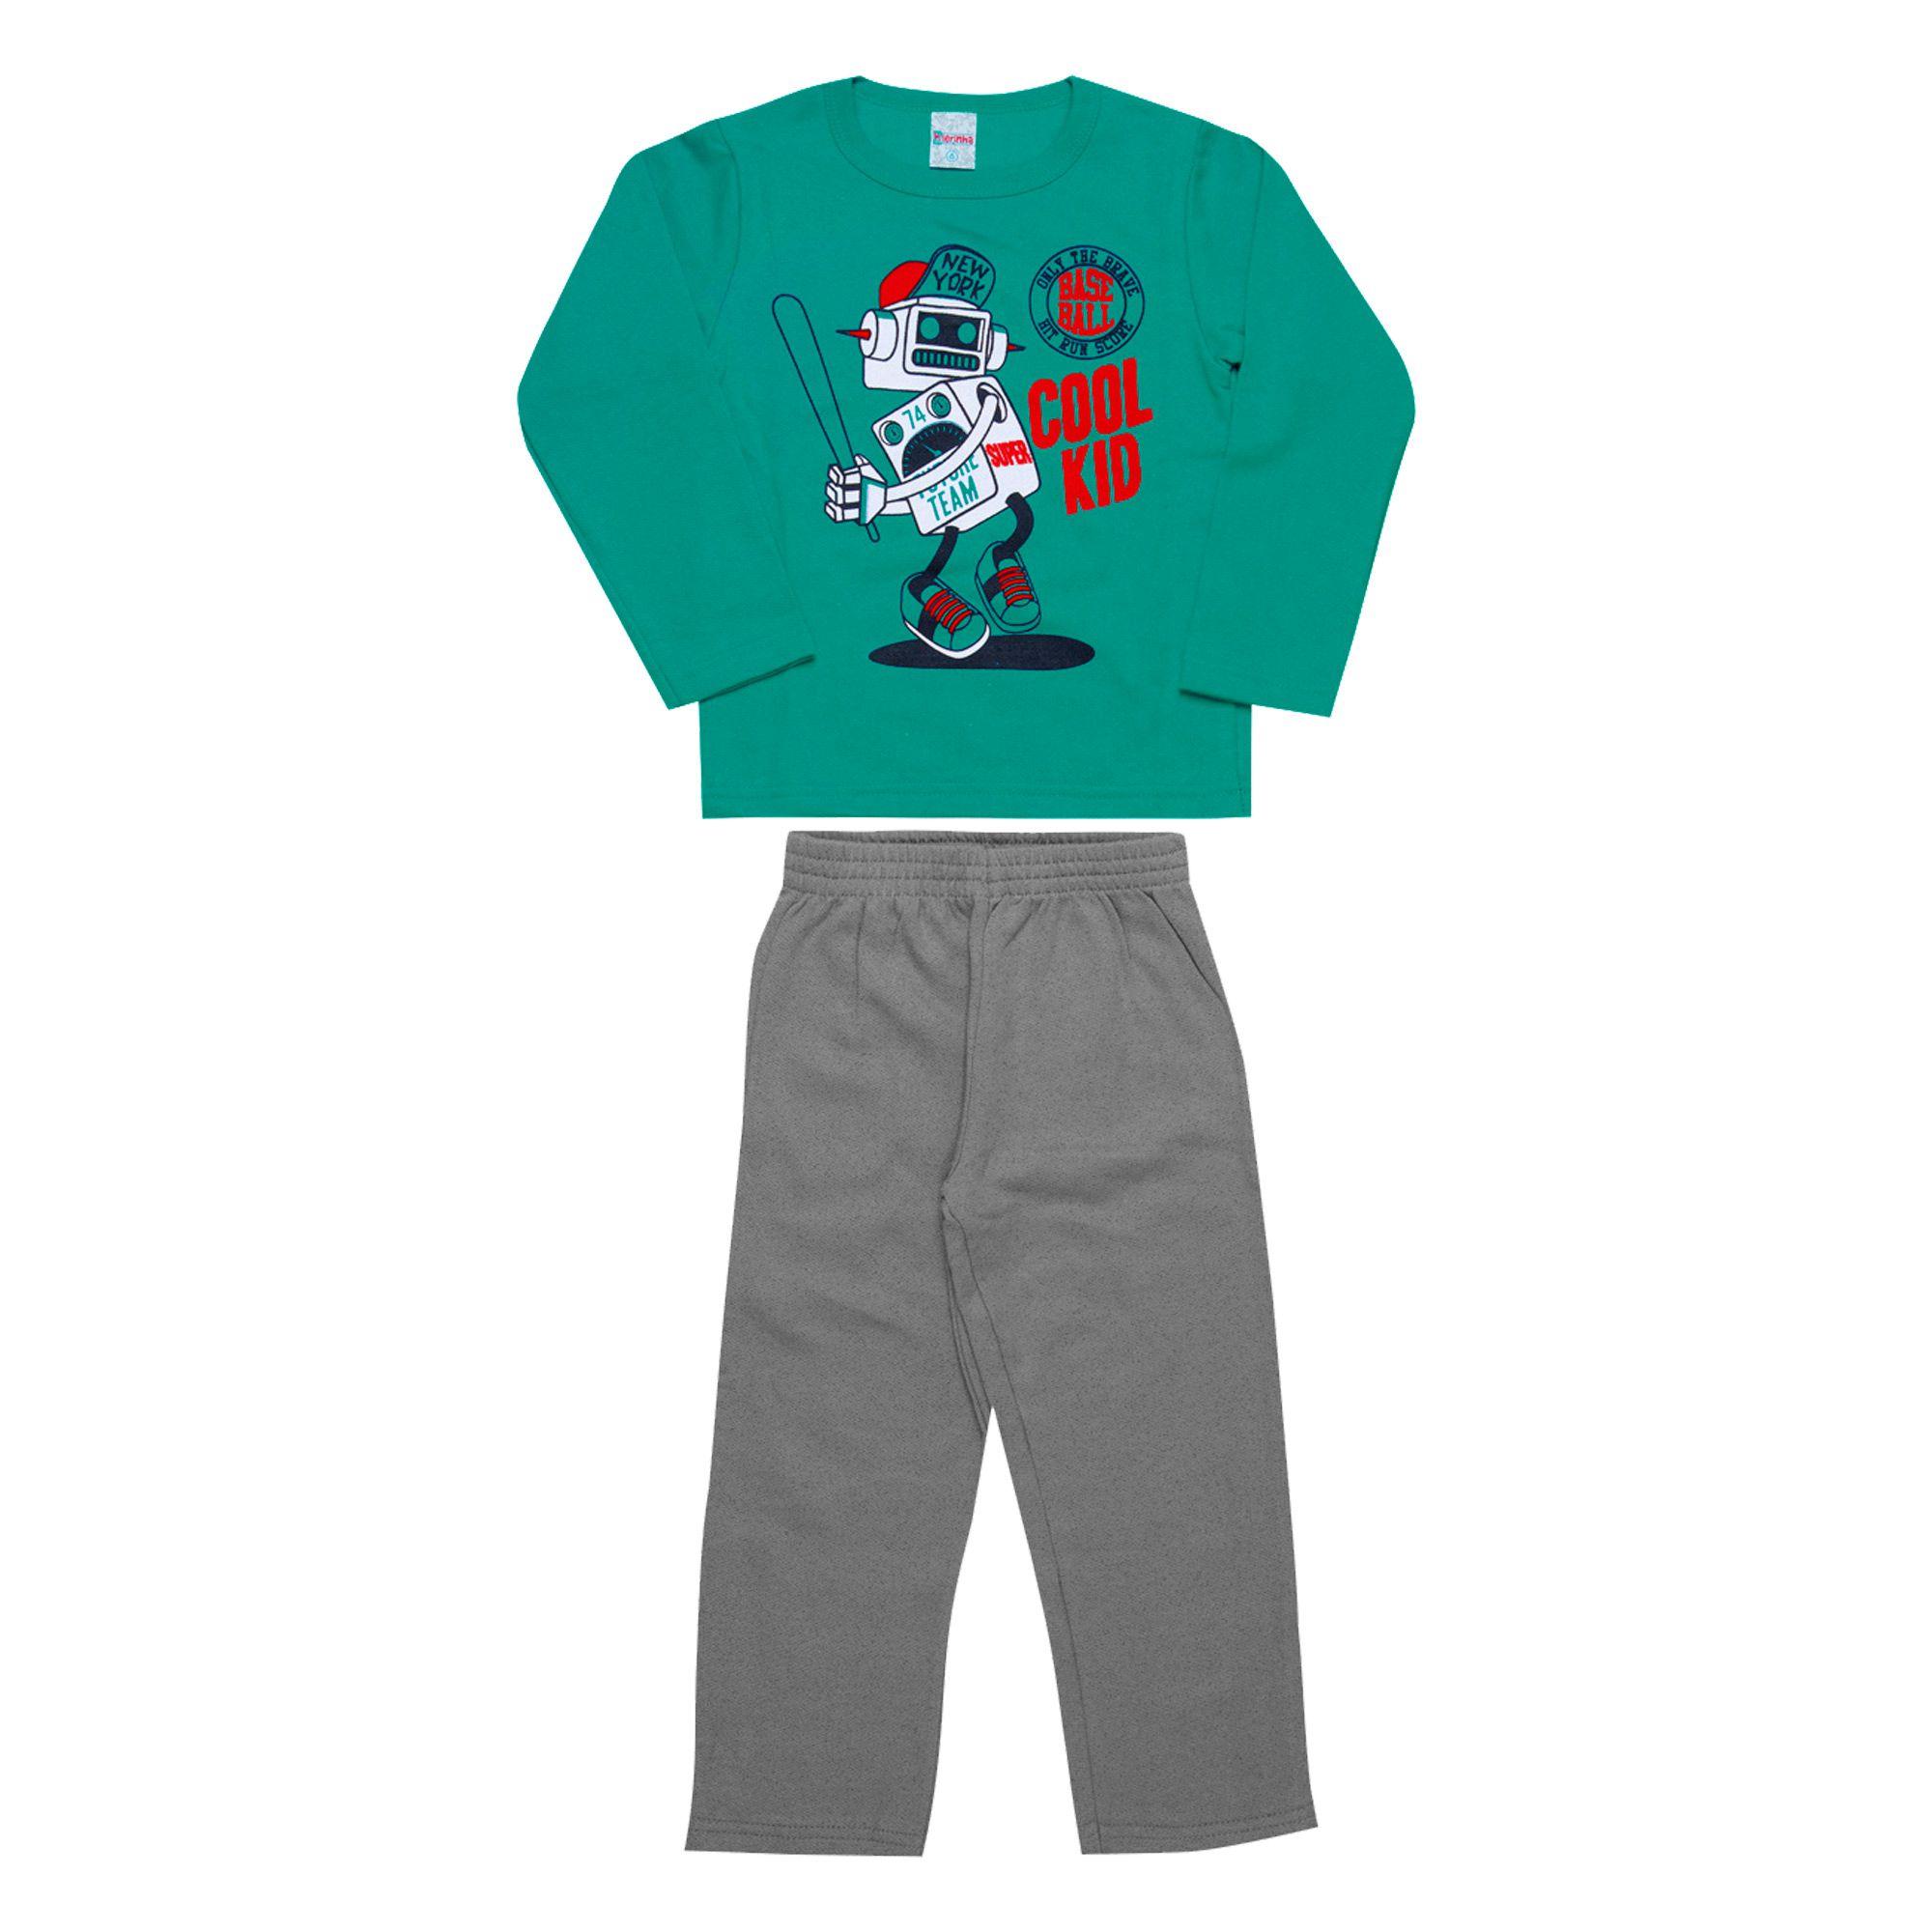 Conjunto Infantil Masculino  2 peças - Ref 1965 - Verde/Mescla